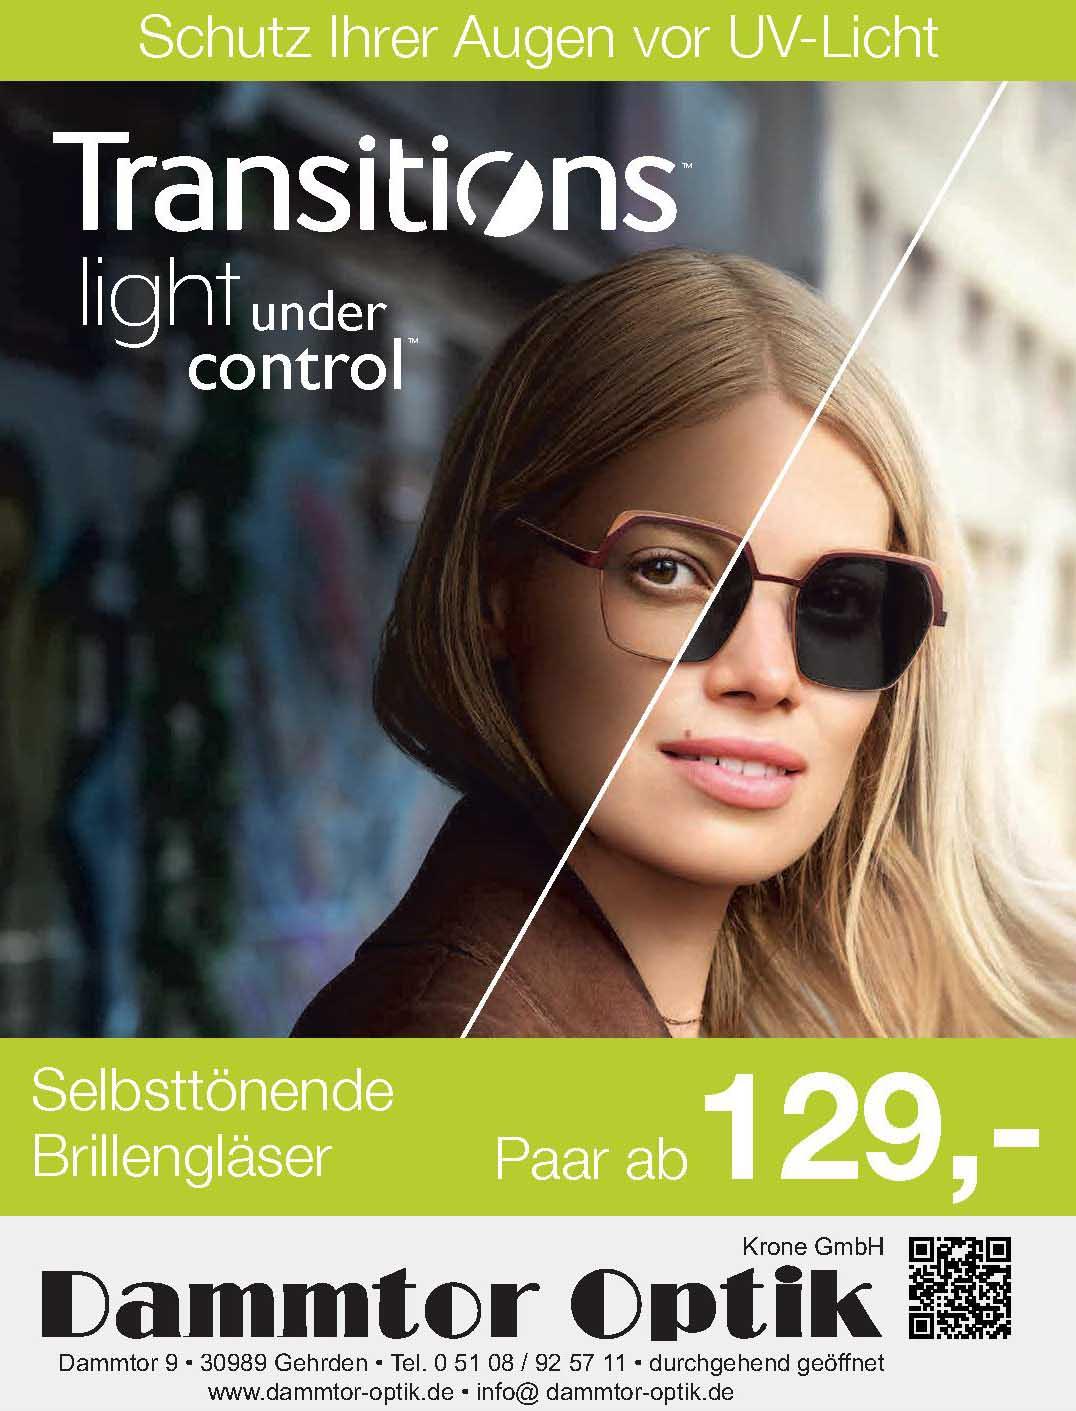 Dammtor Optik Krone GmbH